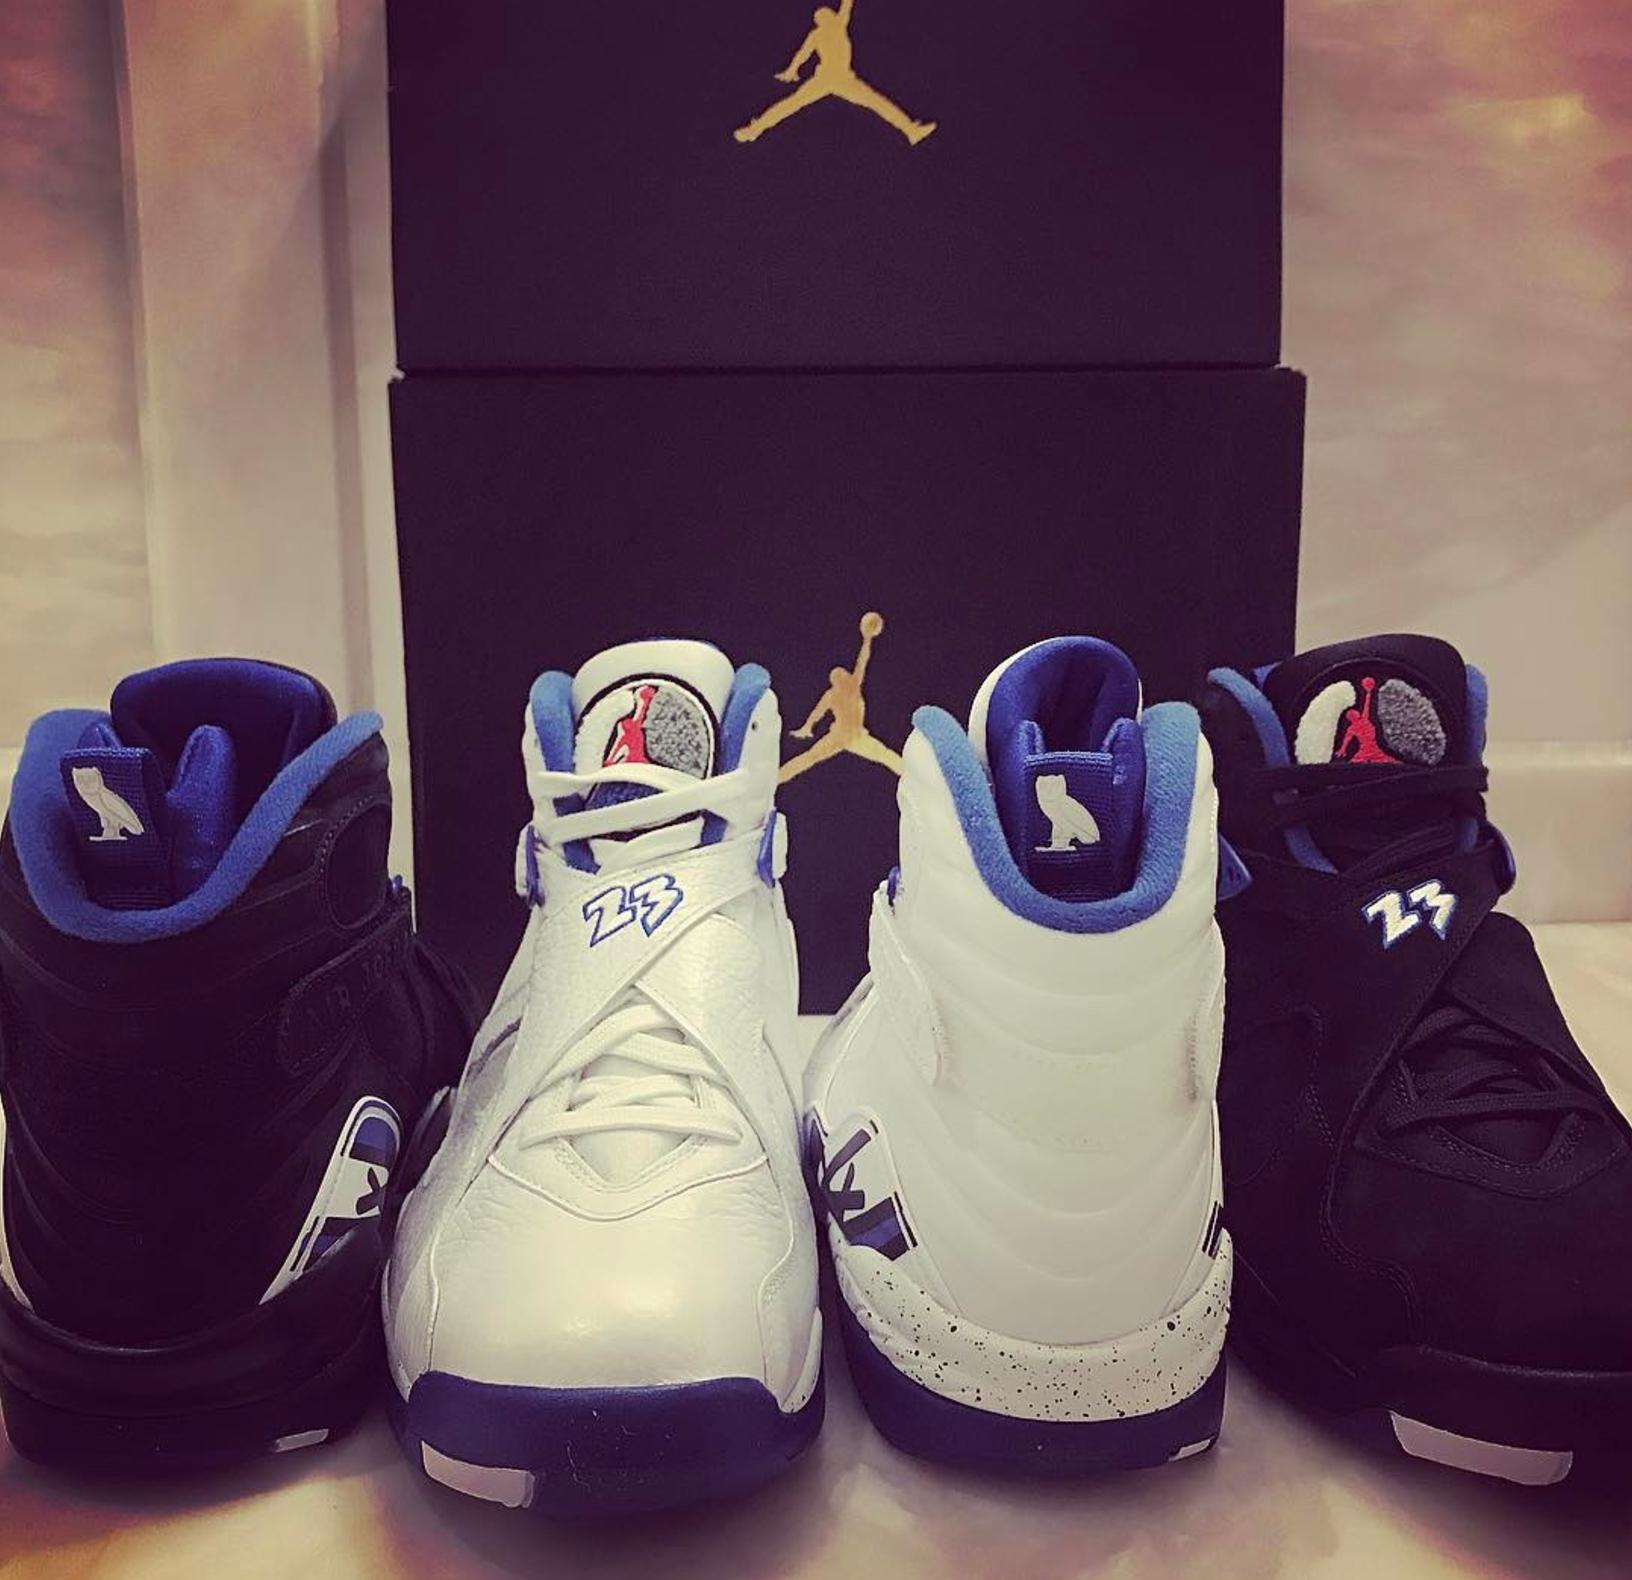 a62c163a737 ... Charles Oakley PE? air jordan OVO Jordan 8 CALIPARI PACK 2 · Jordan  Brand / Kicks On Court ...